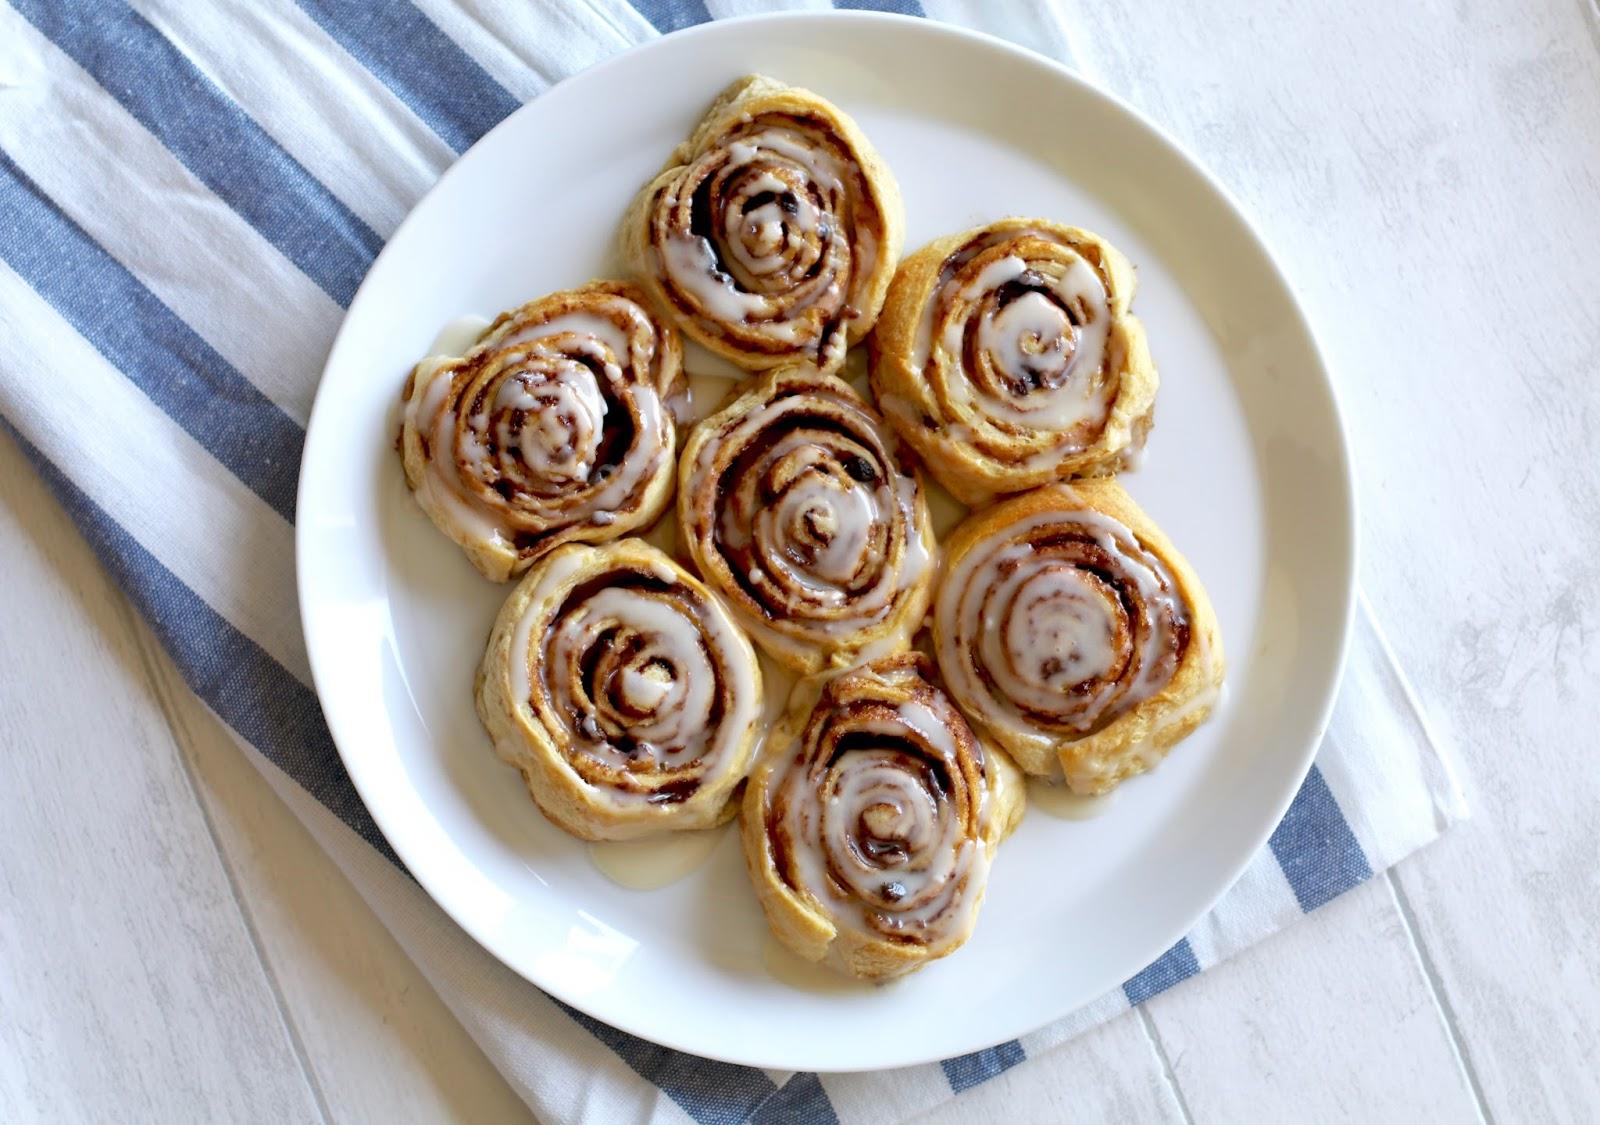 Cheats cinnamon rolls